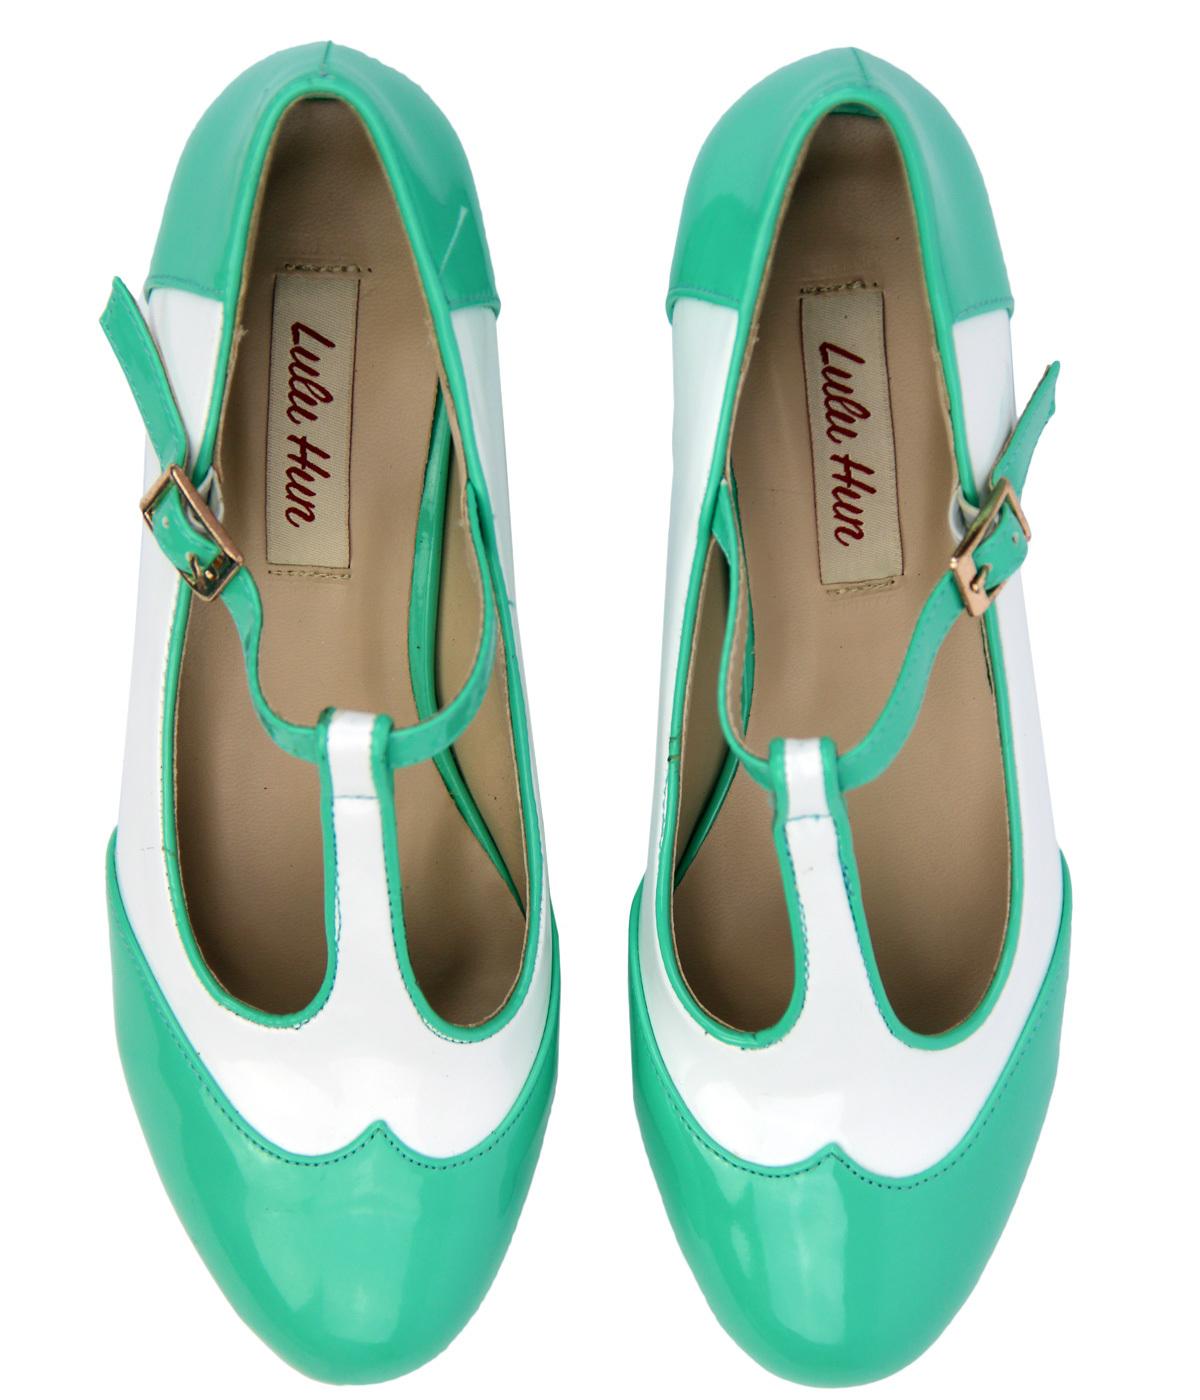 Lulu Hun Shoes Uk